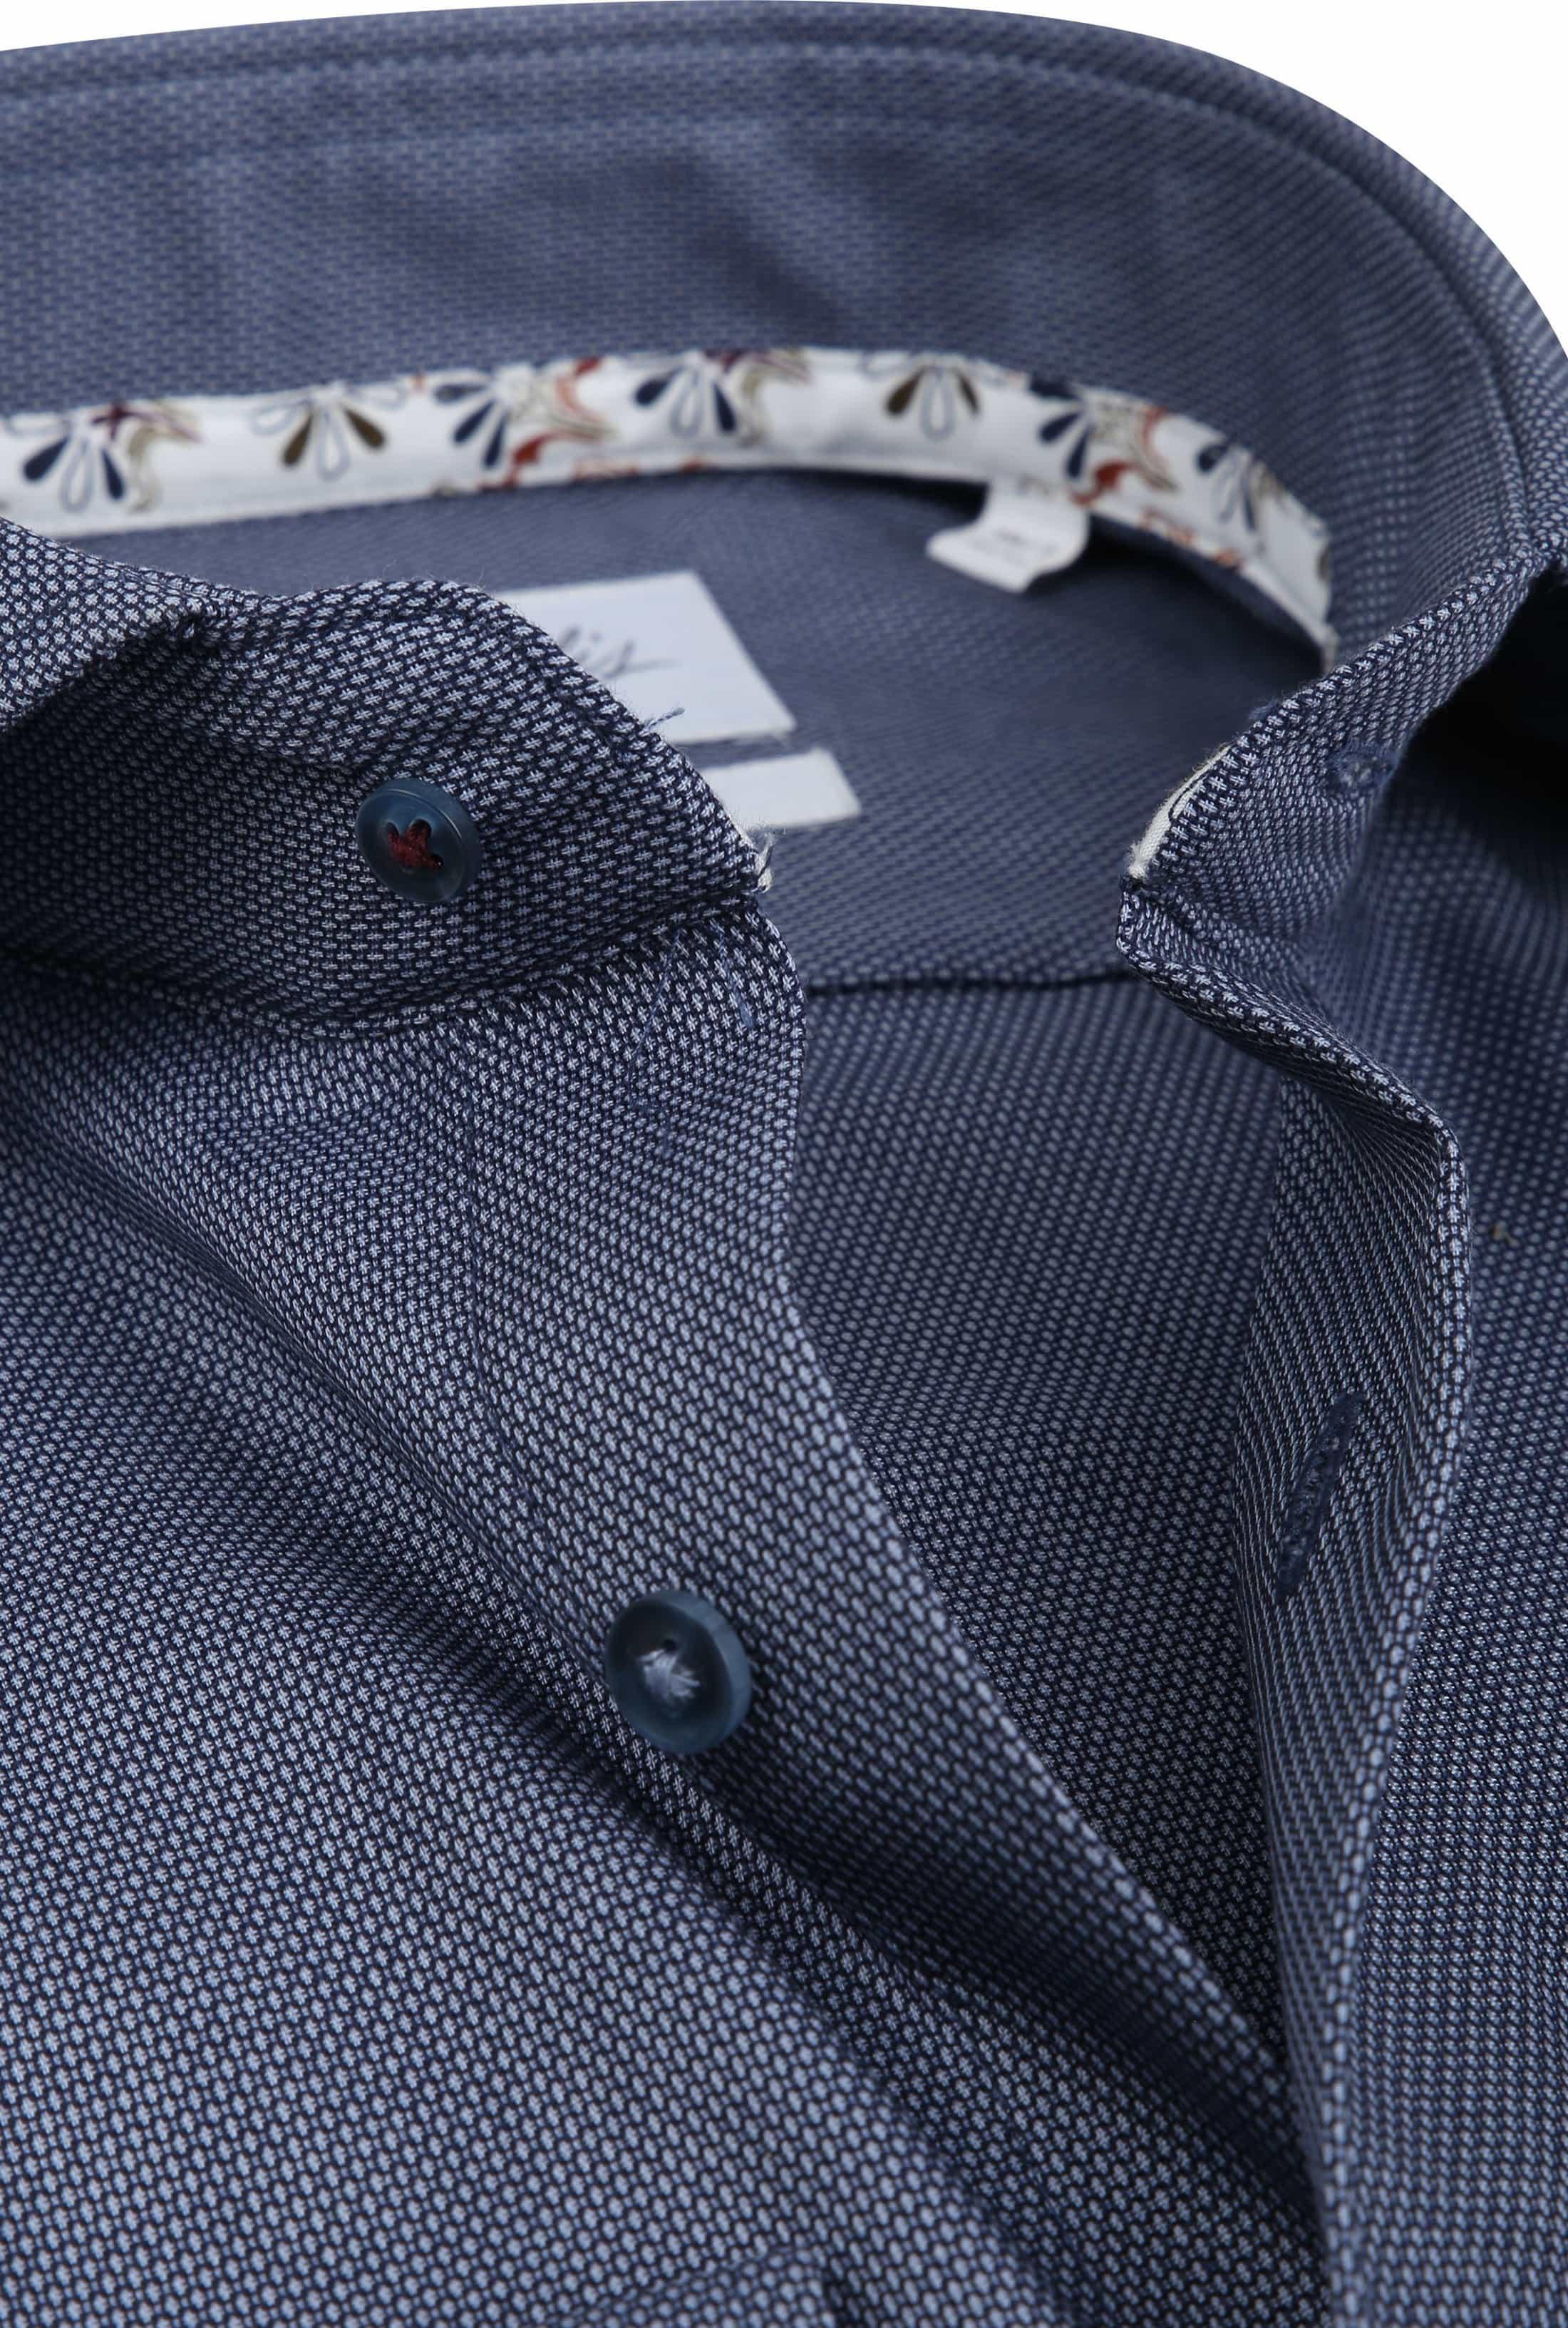 Michaelis Overhemd SF Navy SL7 foto 1